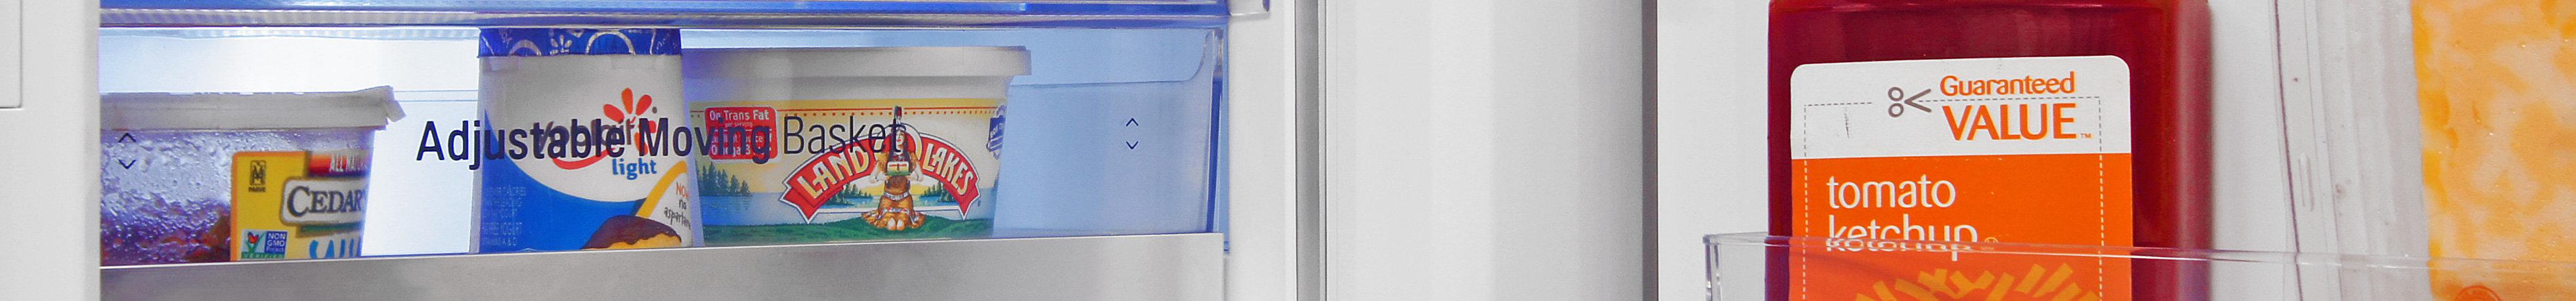 LG LSC22991ST 21.6 Cubic Foot Counter Depth Side by Side with Door in Door Storage